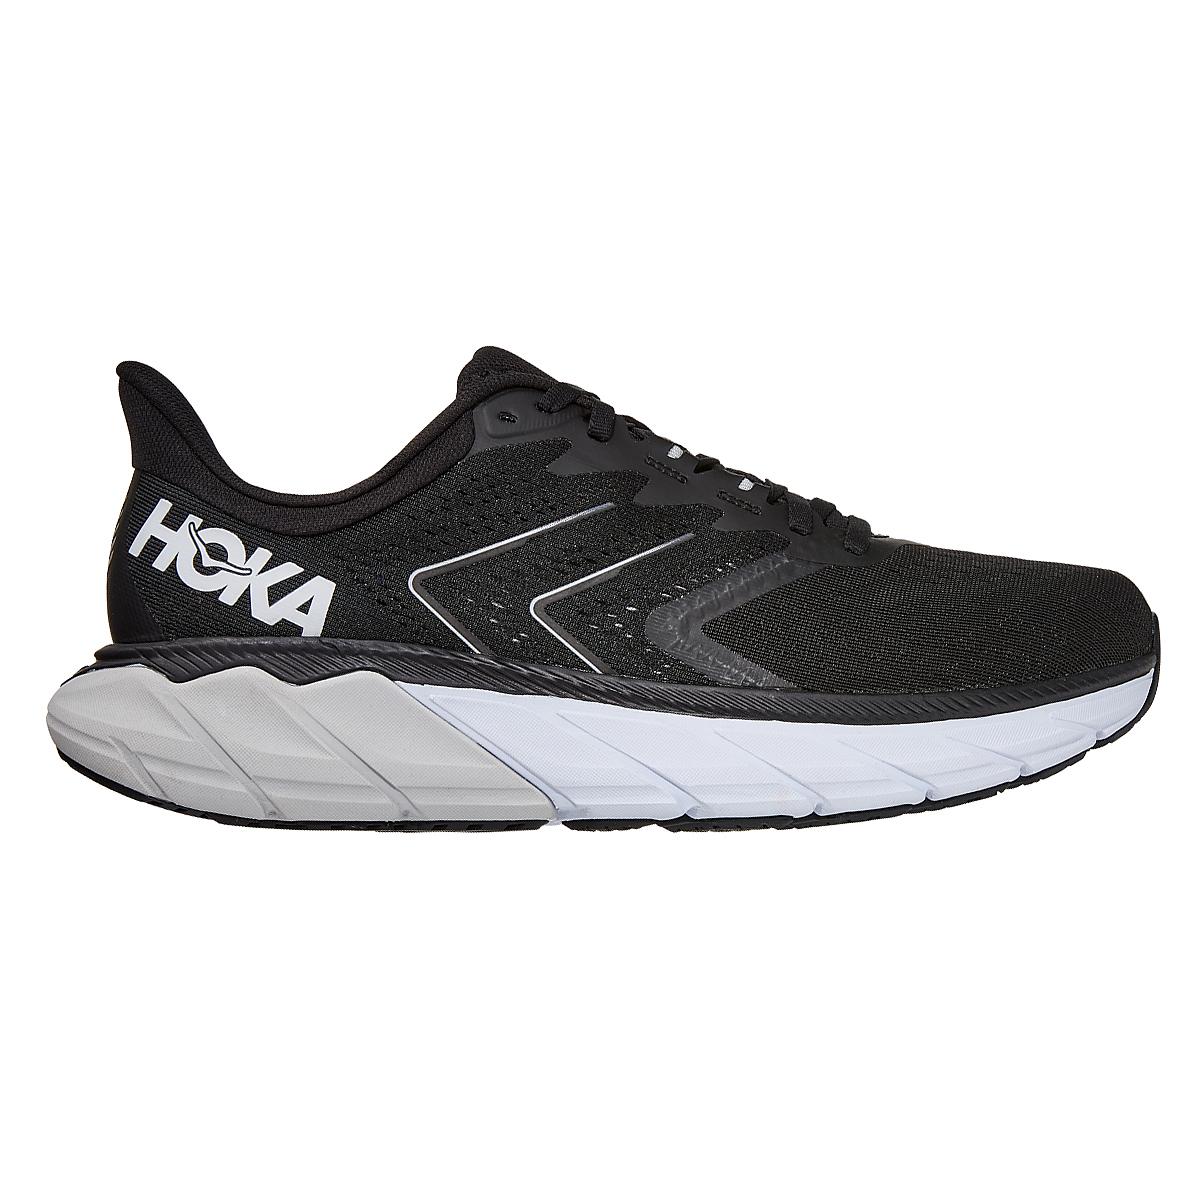 Men's Hoka One One Arahi 5 Running Shoe - Color: Black/White - Size: 7 - Width: Regular, Black/White, large, image 1